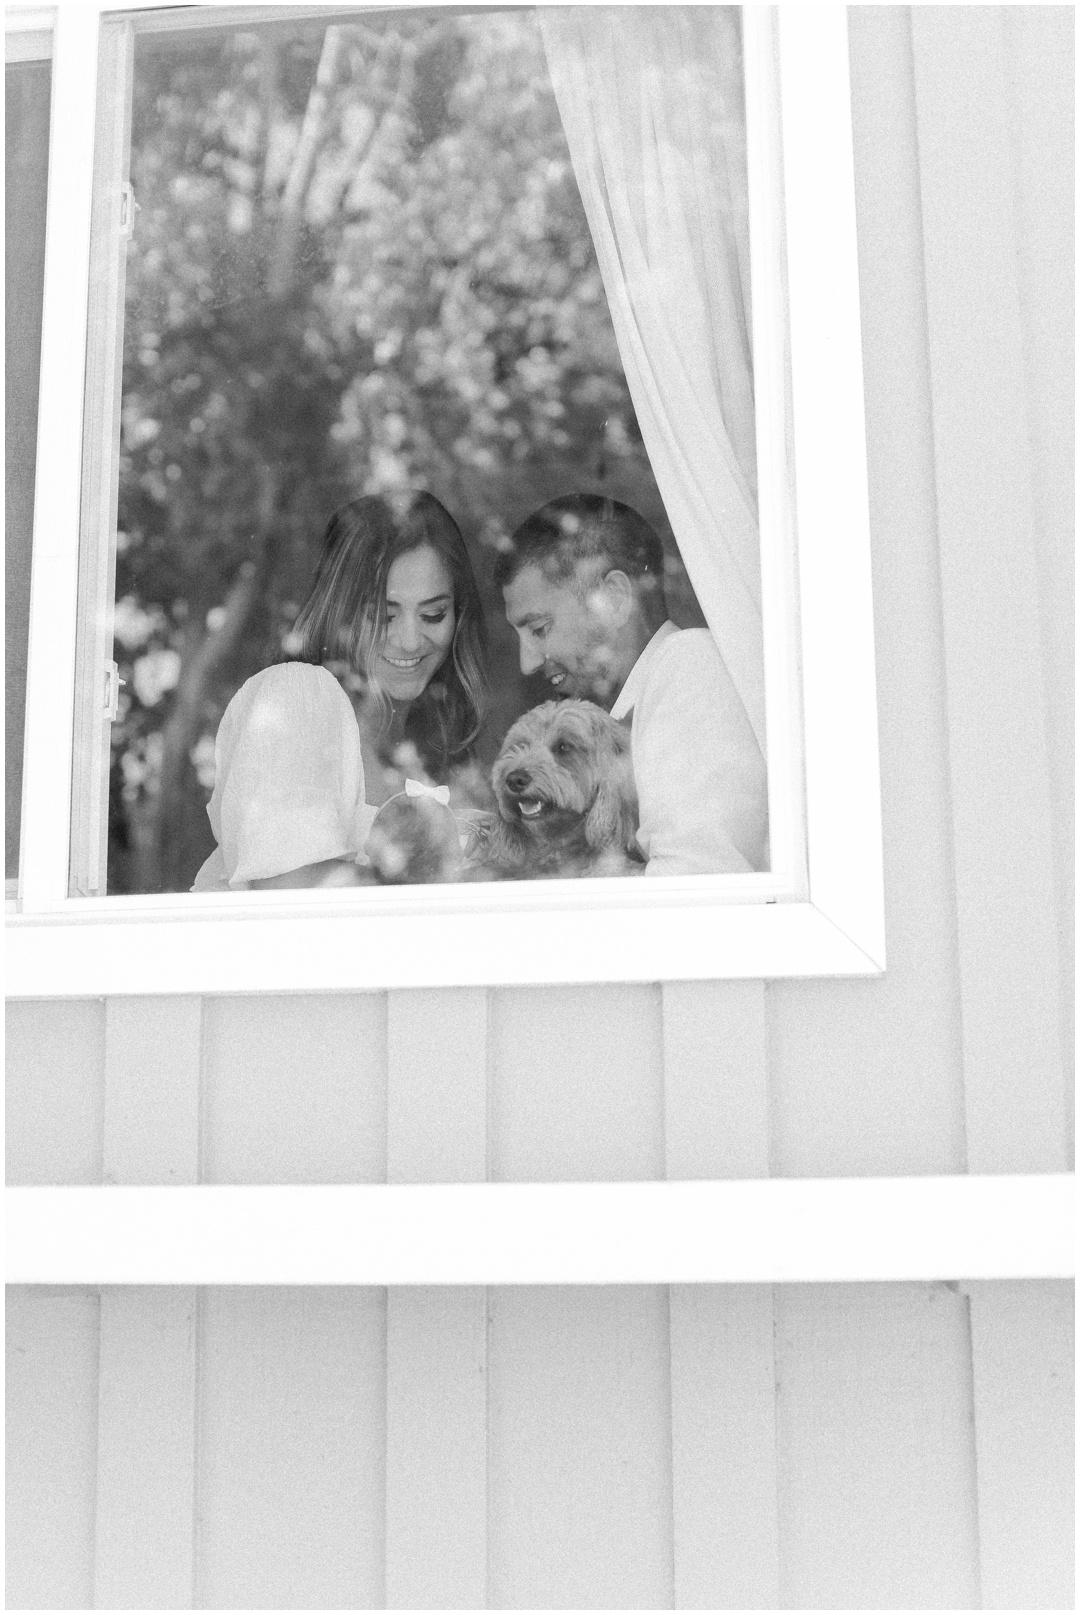 Newport_Beach_Newborn_Light_Airy_Natural_Photographer_Newport_Beach_Photographer_Orange_County_Family_Photographer_Cori_Kleckner_Photography_Newport_Beach_Photographer_Taylor_Colacion_Newborn_Lifestyle_photos__4140.jpg